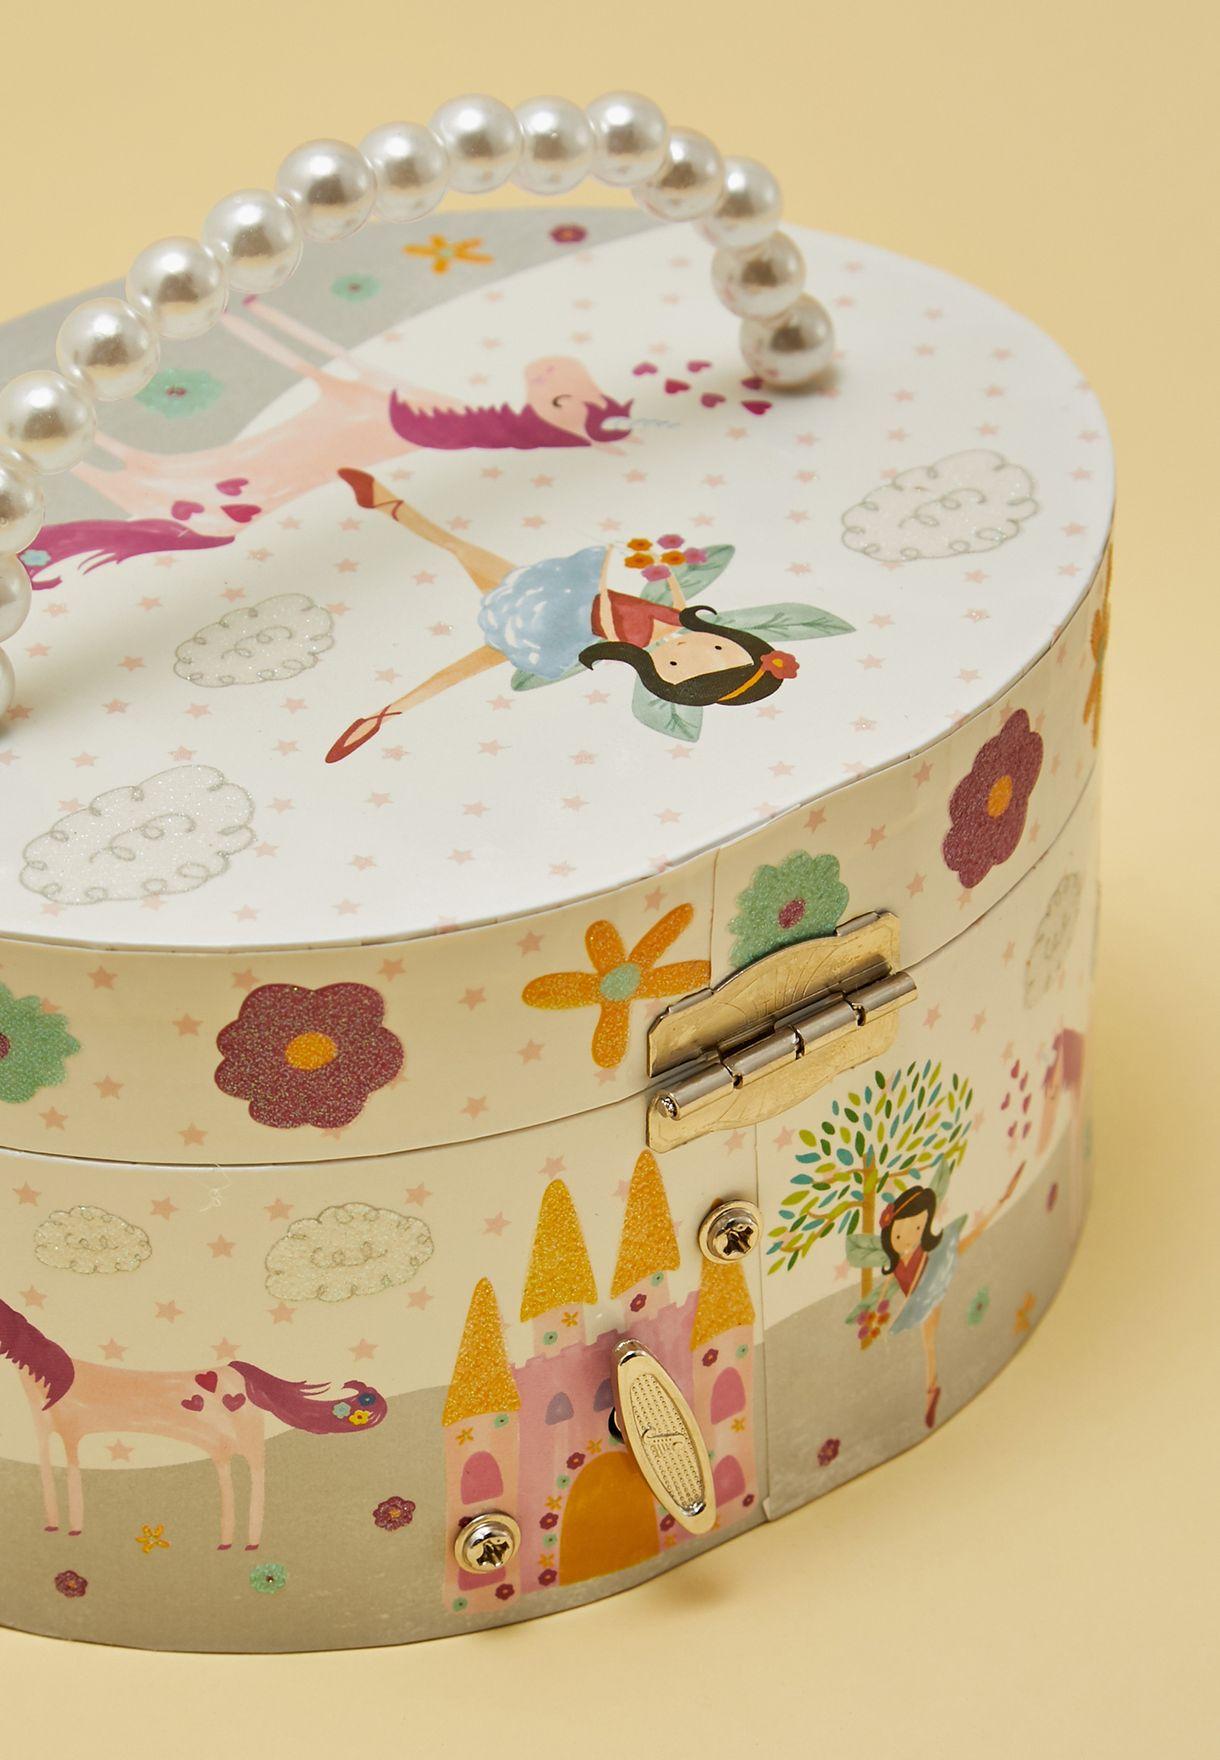 صندوق موسيقي لحفظ المجوهرات